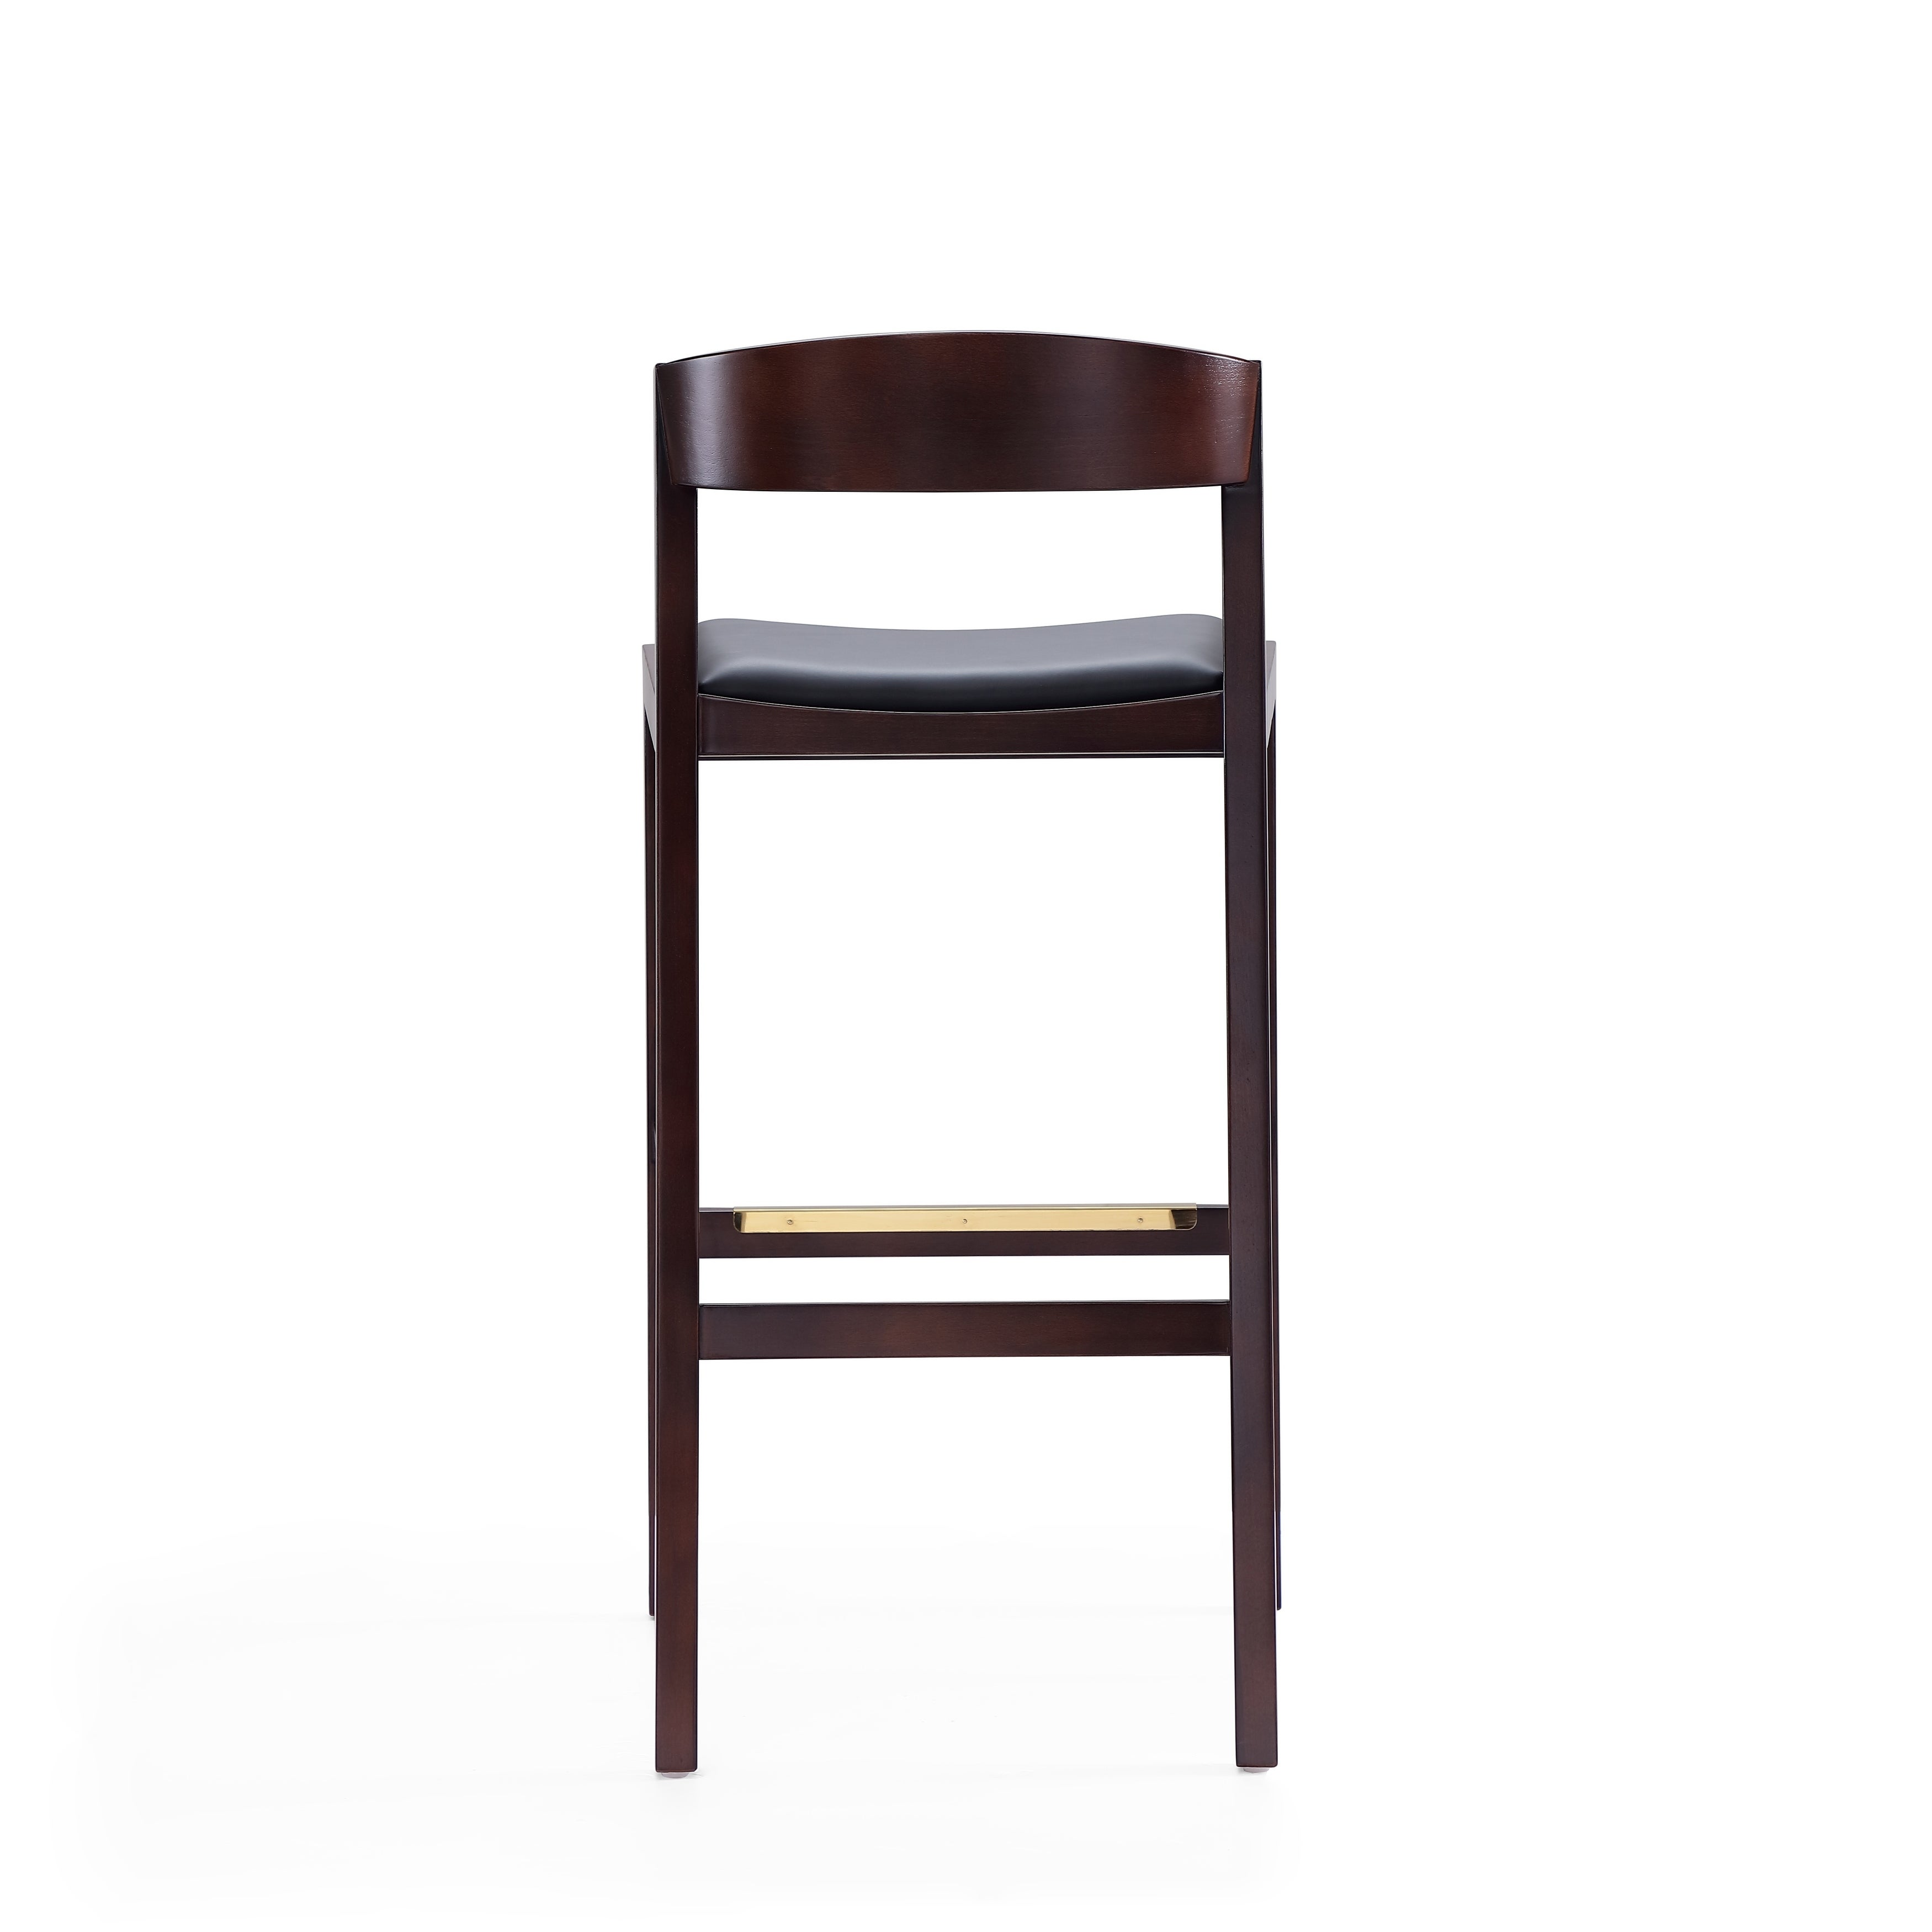 Incredible Ceets Modern And Sleek Klismos Bar Stool Machost Co Dining Chair Design Ideas Machostcouk